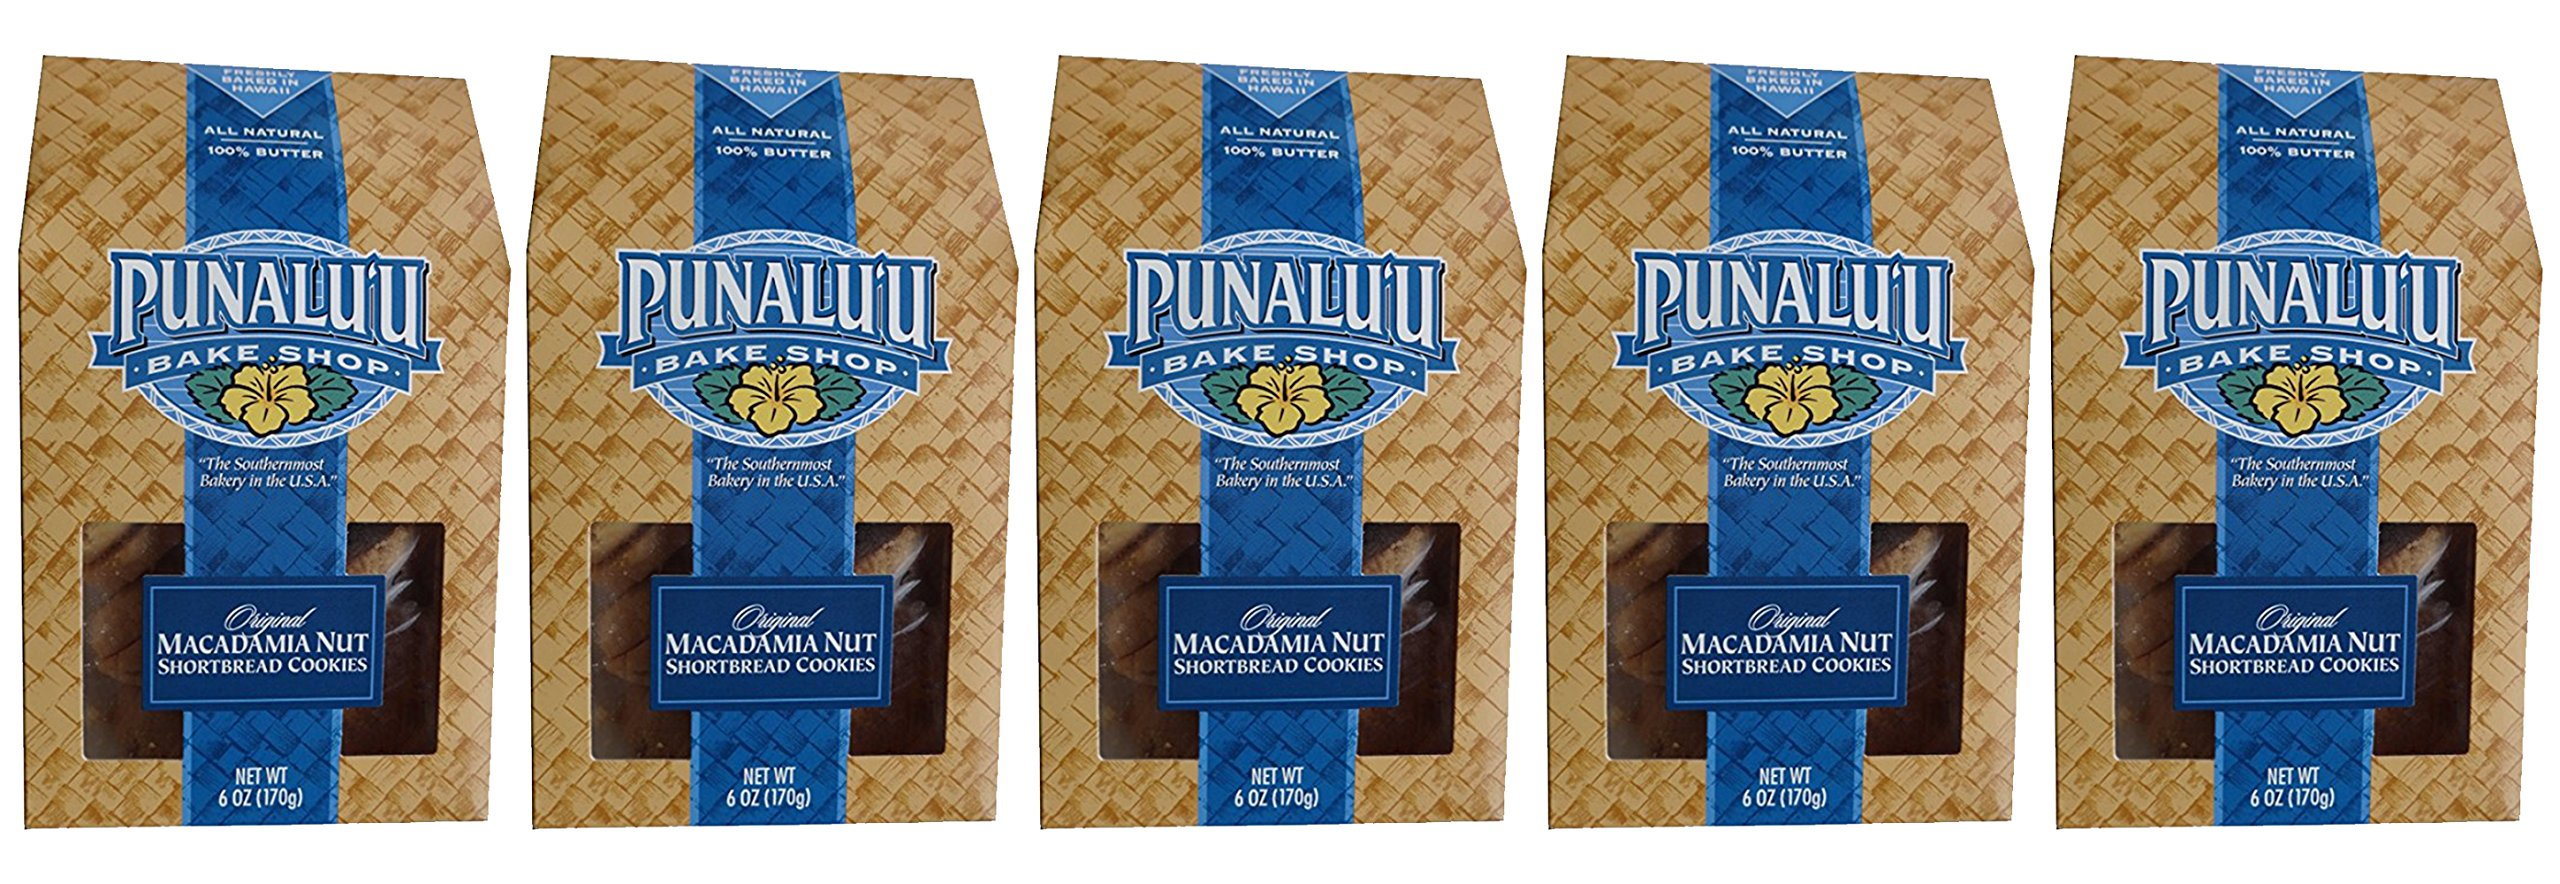 5 Box Count of Fresh Baked Punalu'u Bake Shop Shortbread Cookies (All Original)